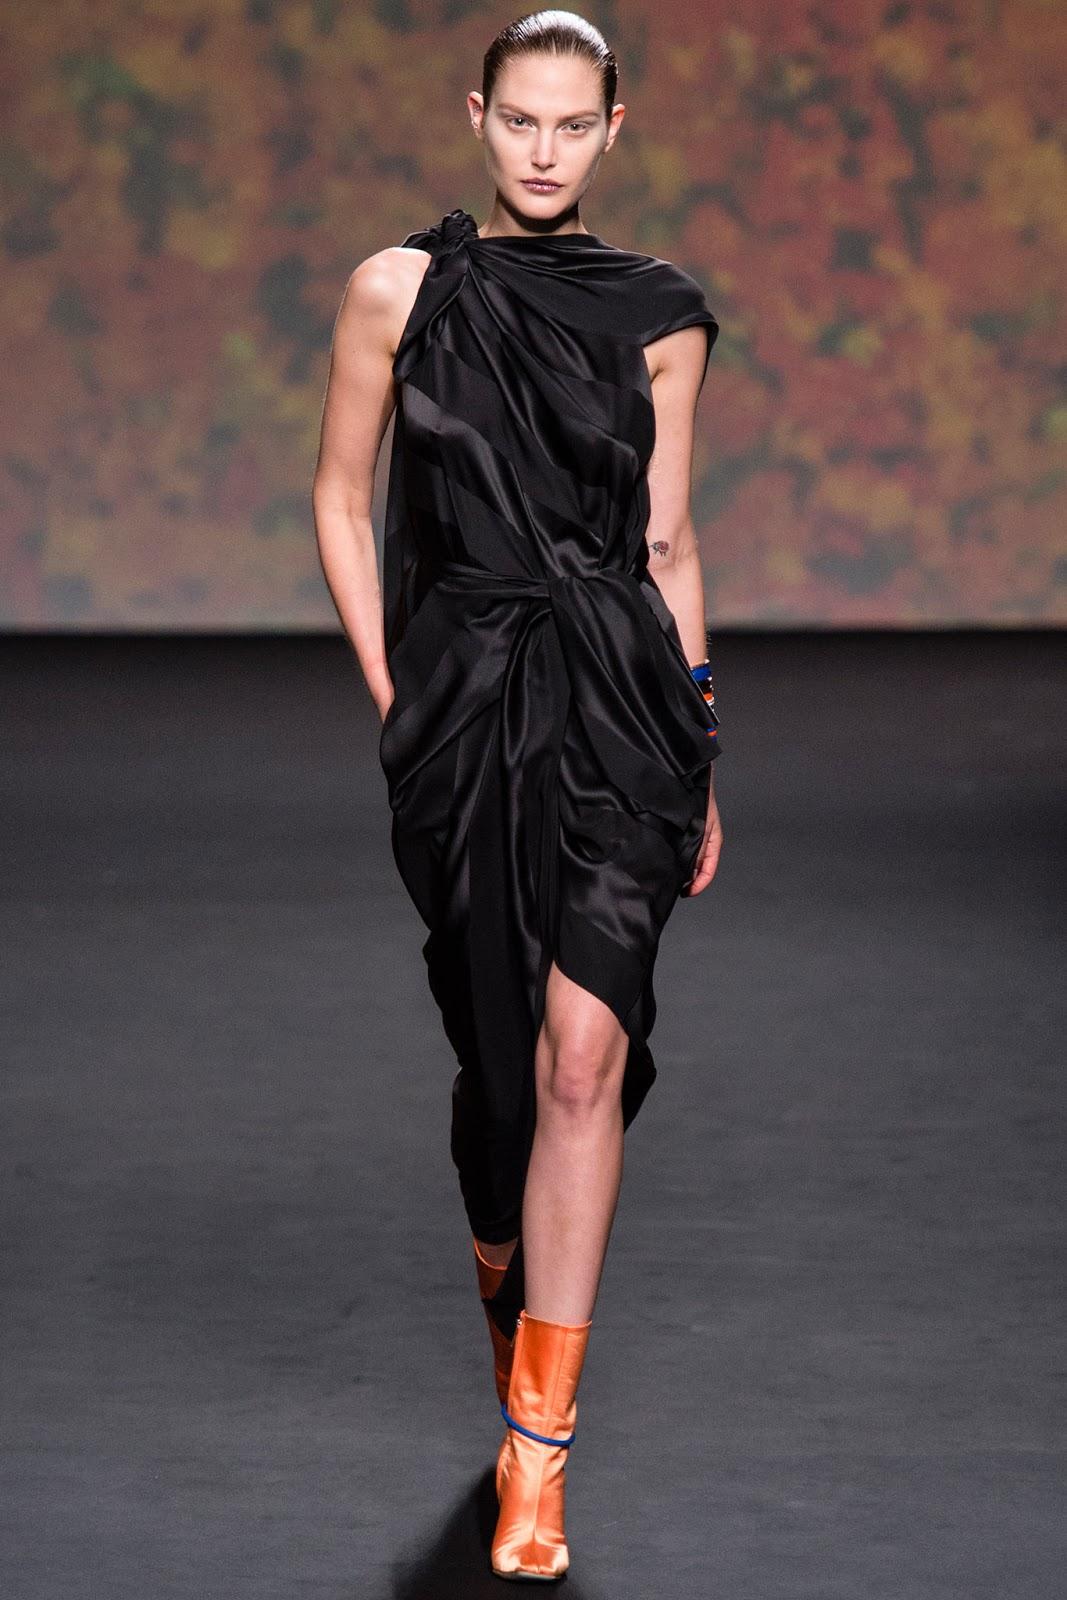 CHRISTIAN DIOR HAUTE COUTURE FALL WINTER 2014 (18)  Christian Dior Haute Couture 2014